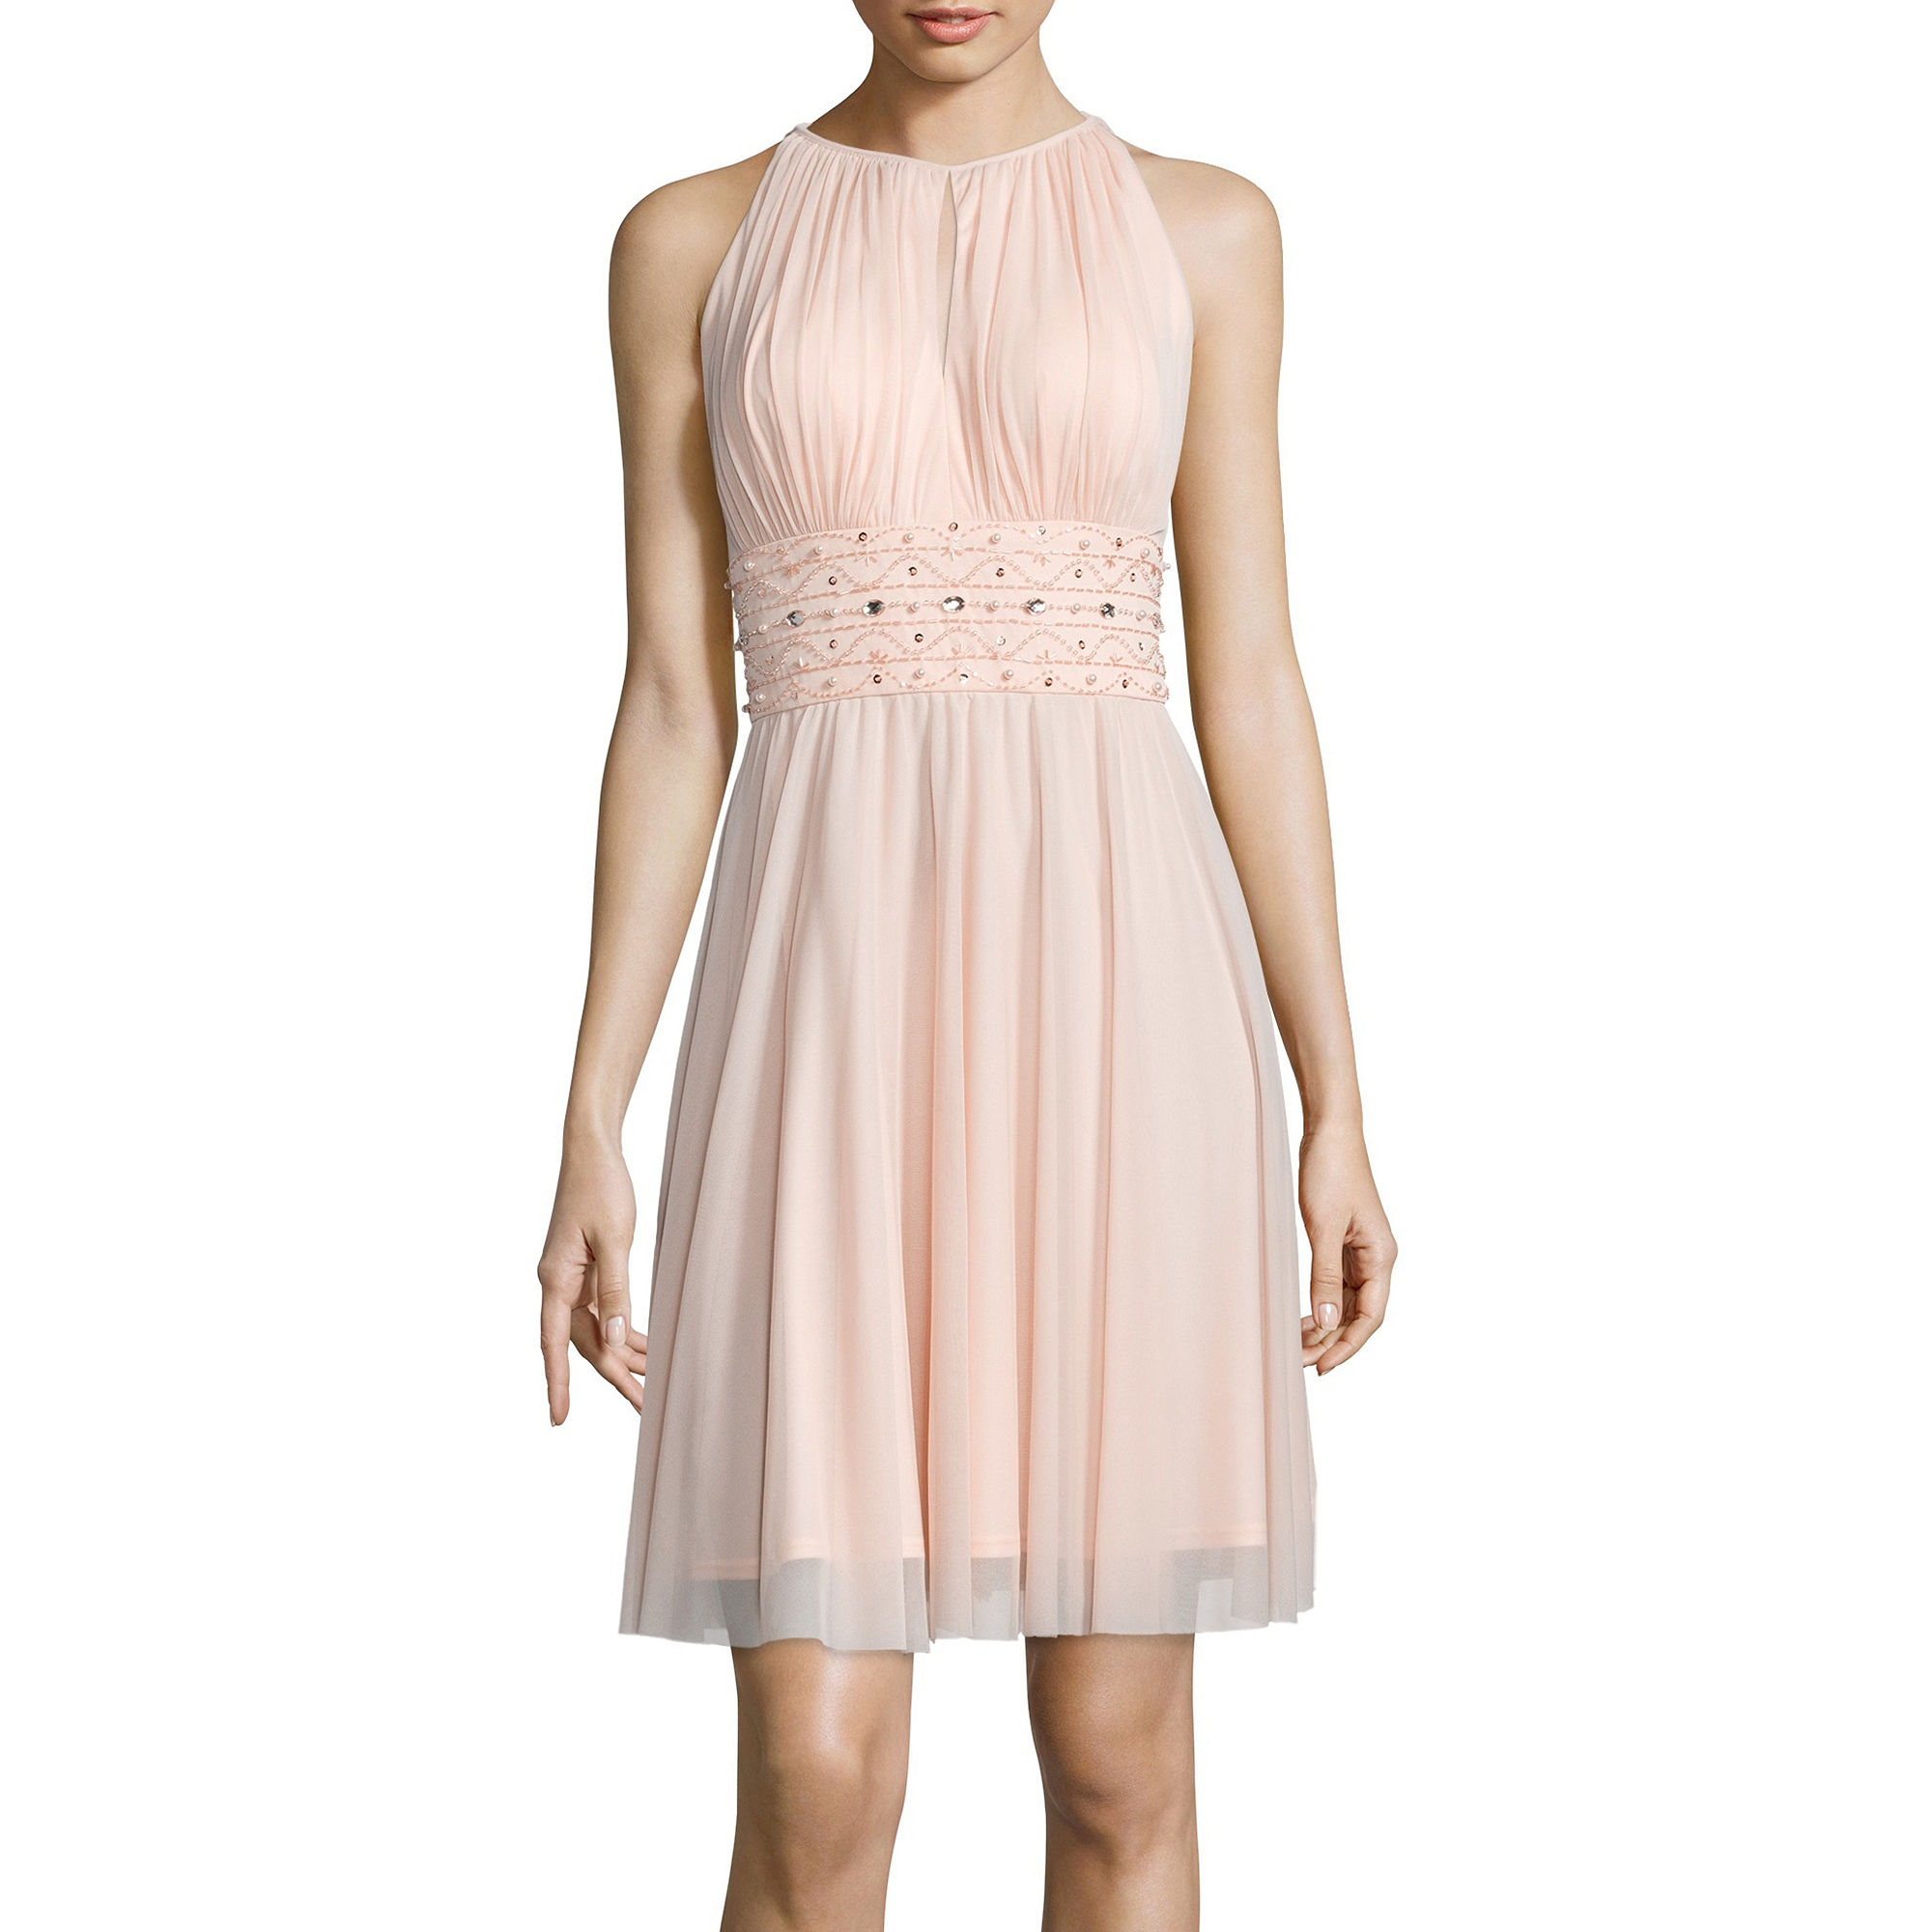 cb3db1ae799 689886717273. La Nouvelle Renaissance Sleeveless Beaded Halter Dress